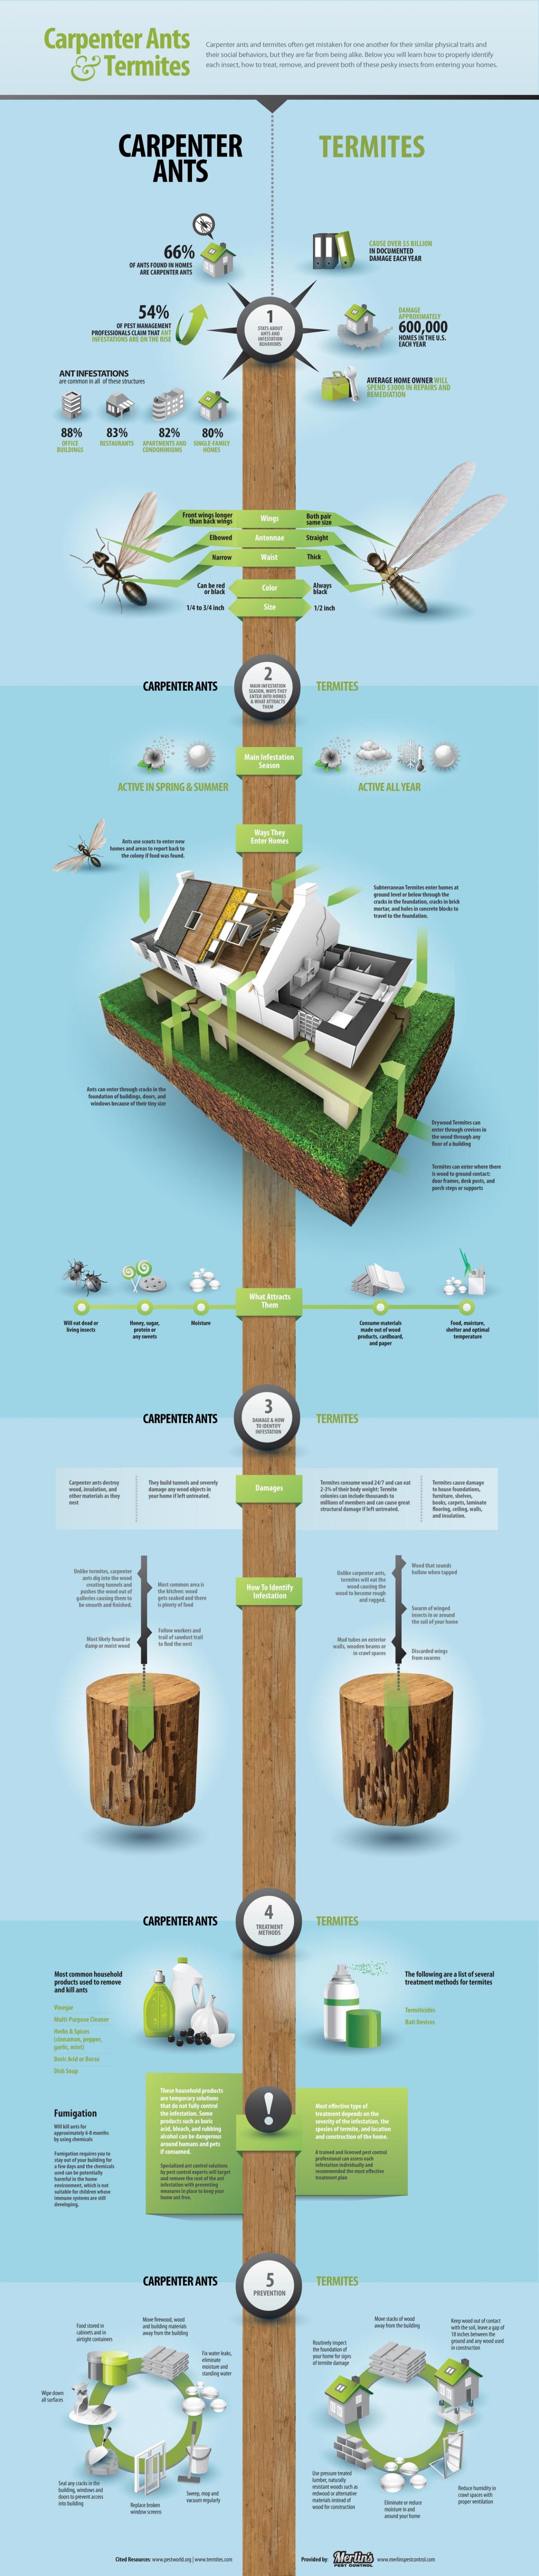 Carpenter Ants & Termites Infographic